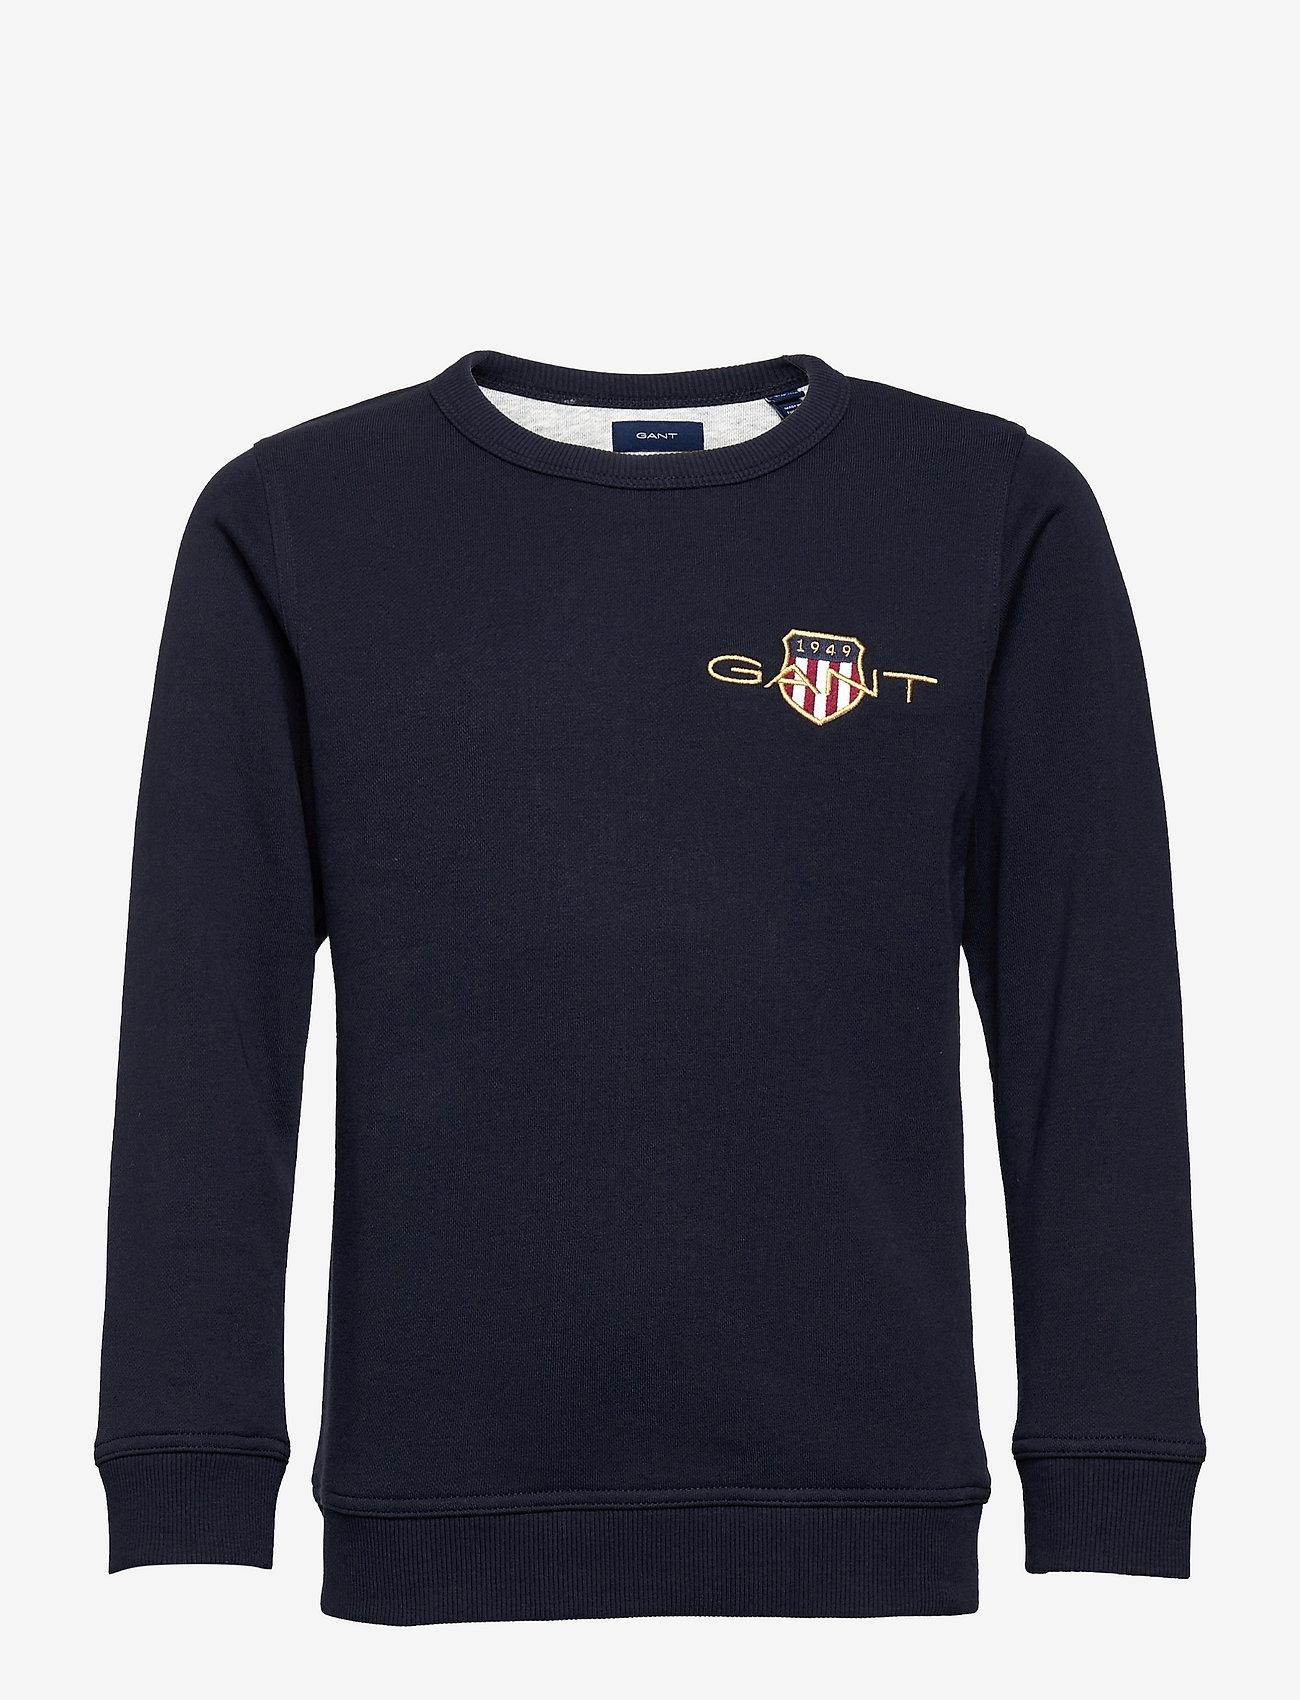 GANT - ARCHIVE SHIELD EMB C-NECK - sweatshirts - evening blue - 0